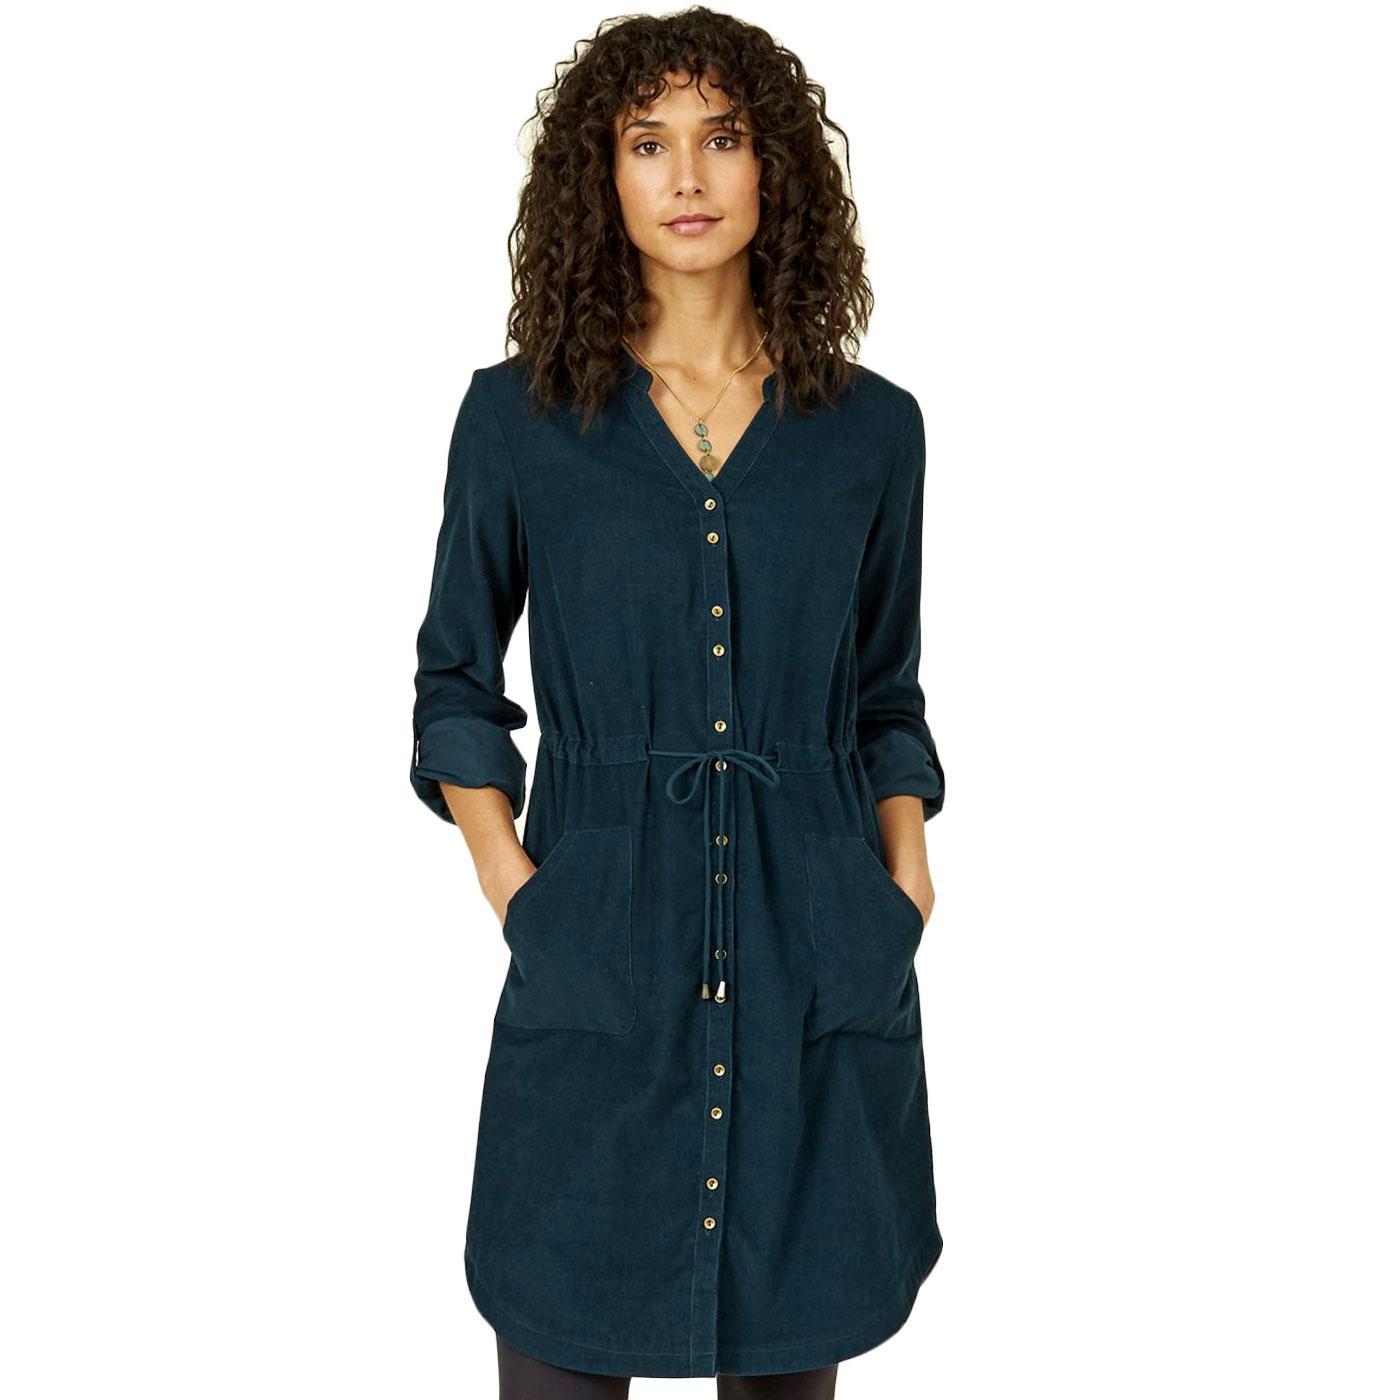 NOMADS 70s Vintage Ruched Waist Cord Shirt Dress